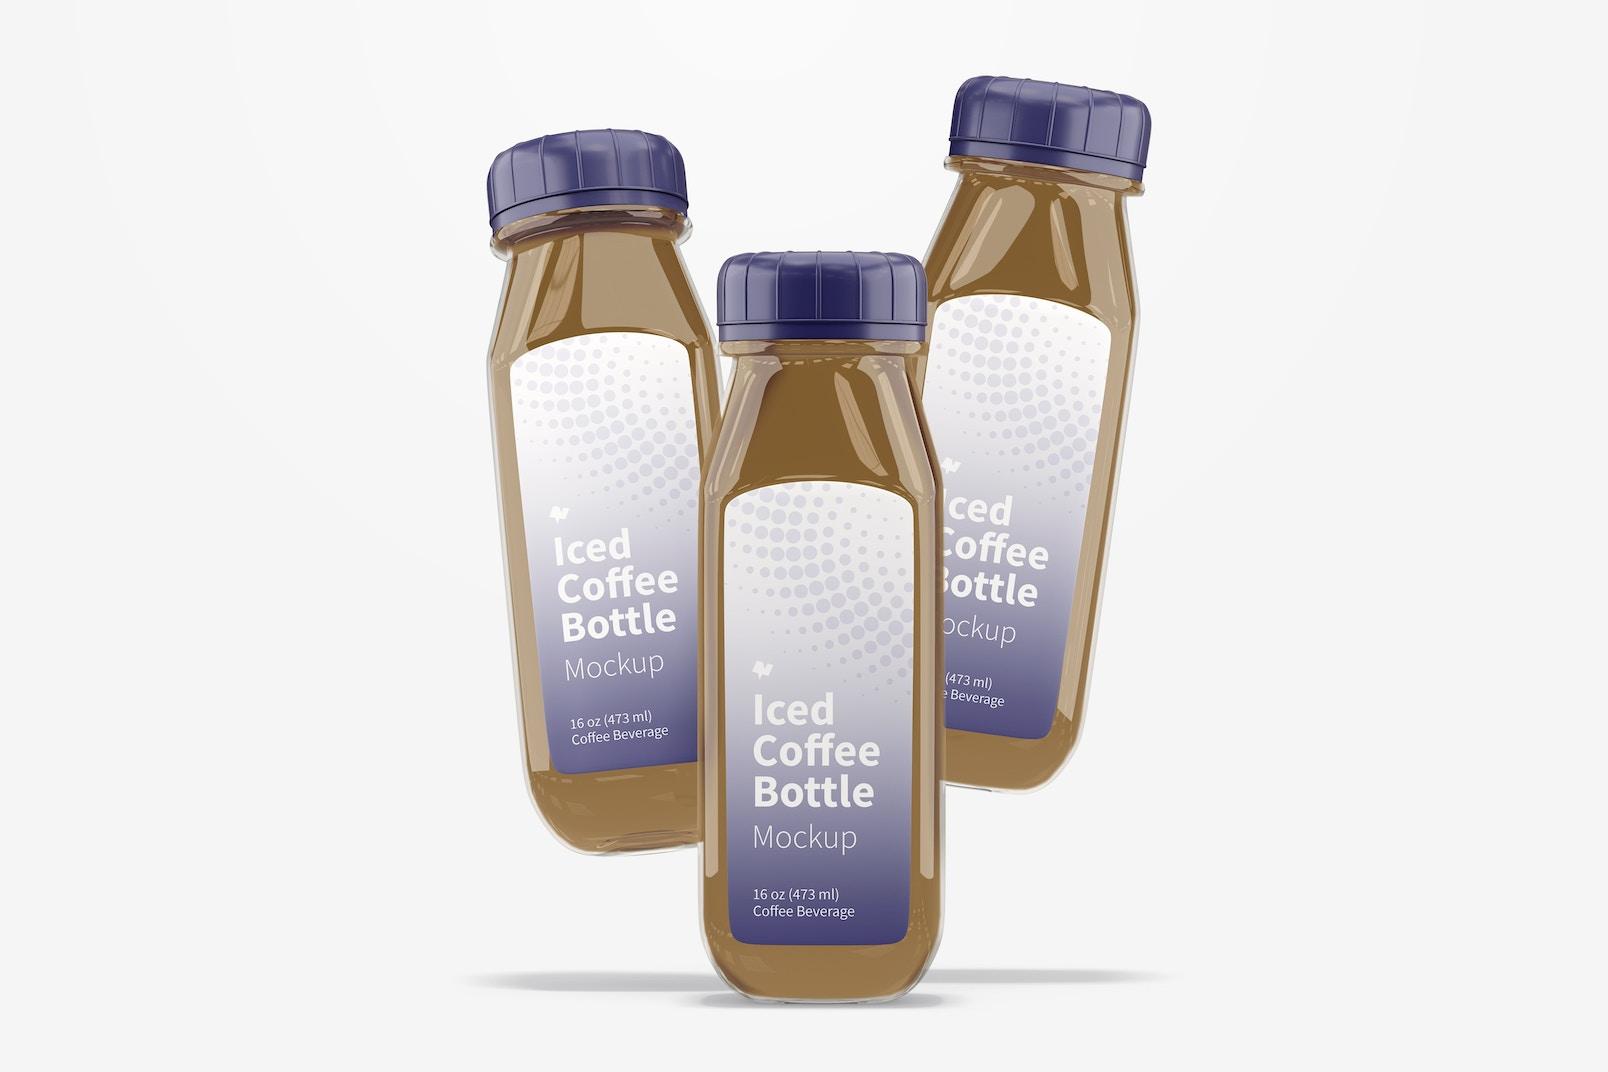 Iced Coffee Glass Bottles Mockup